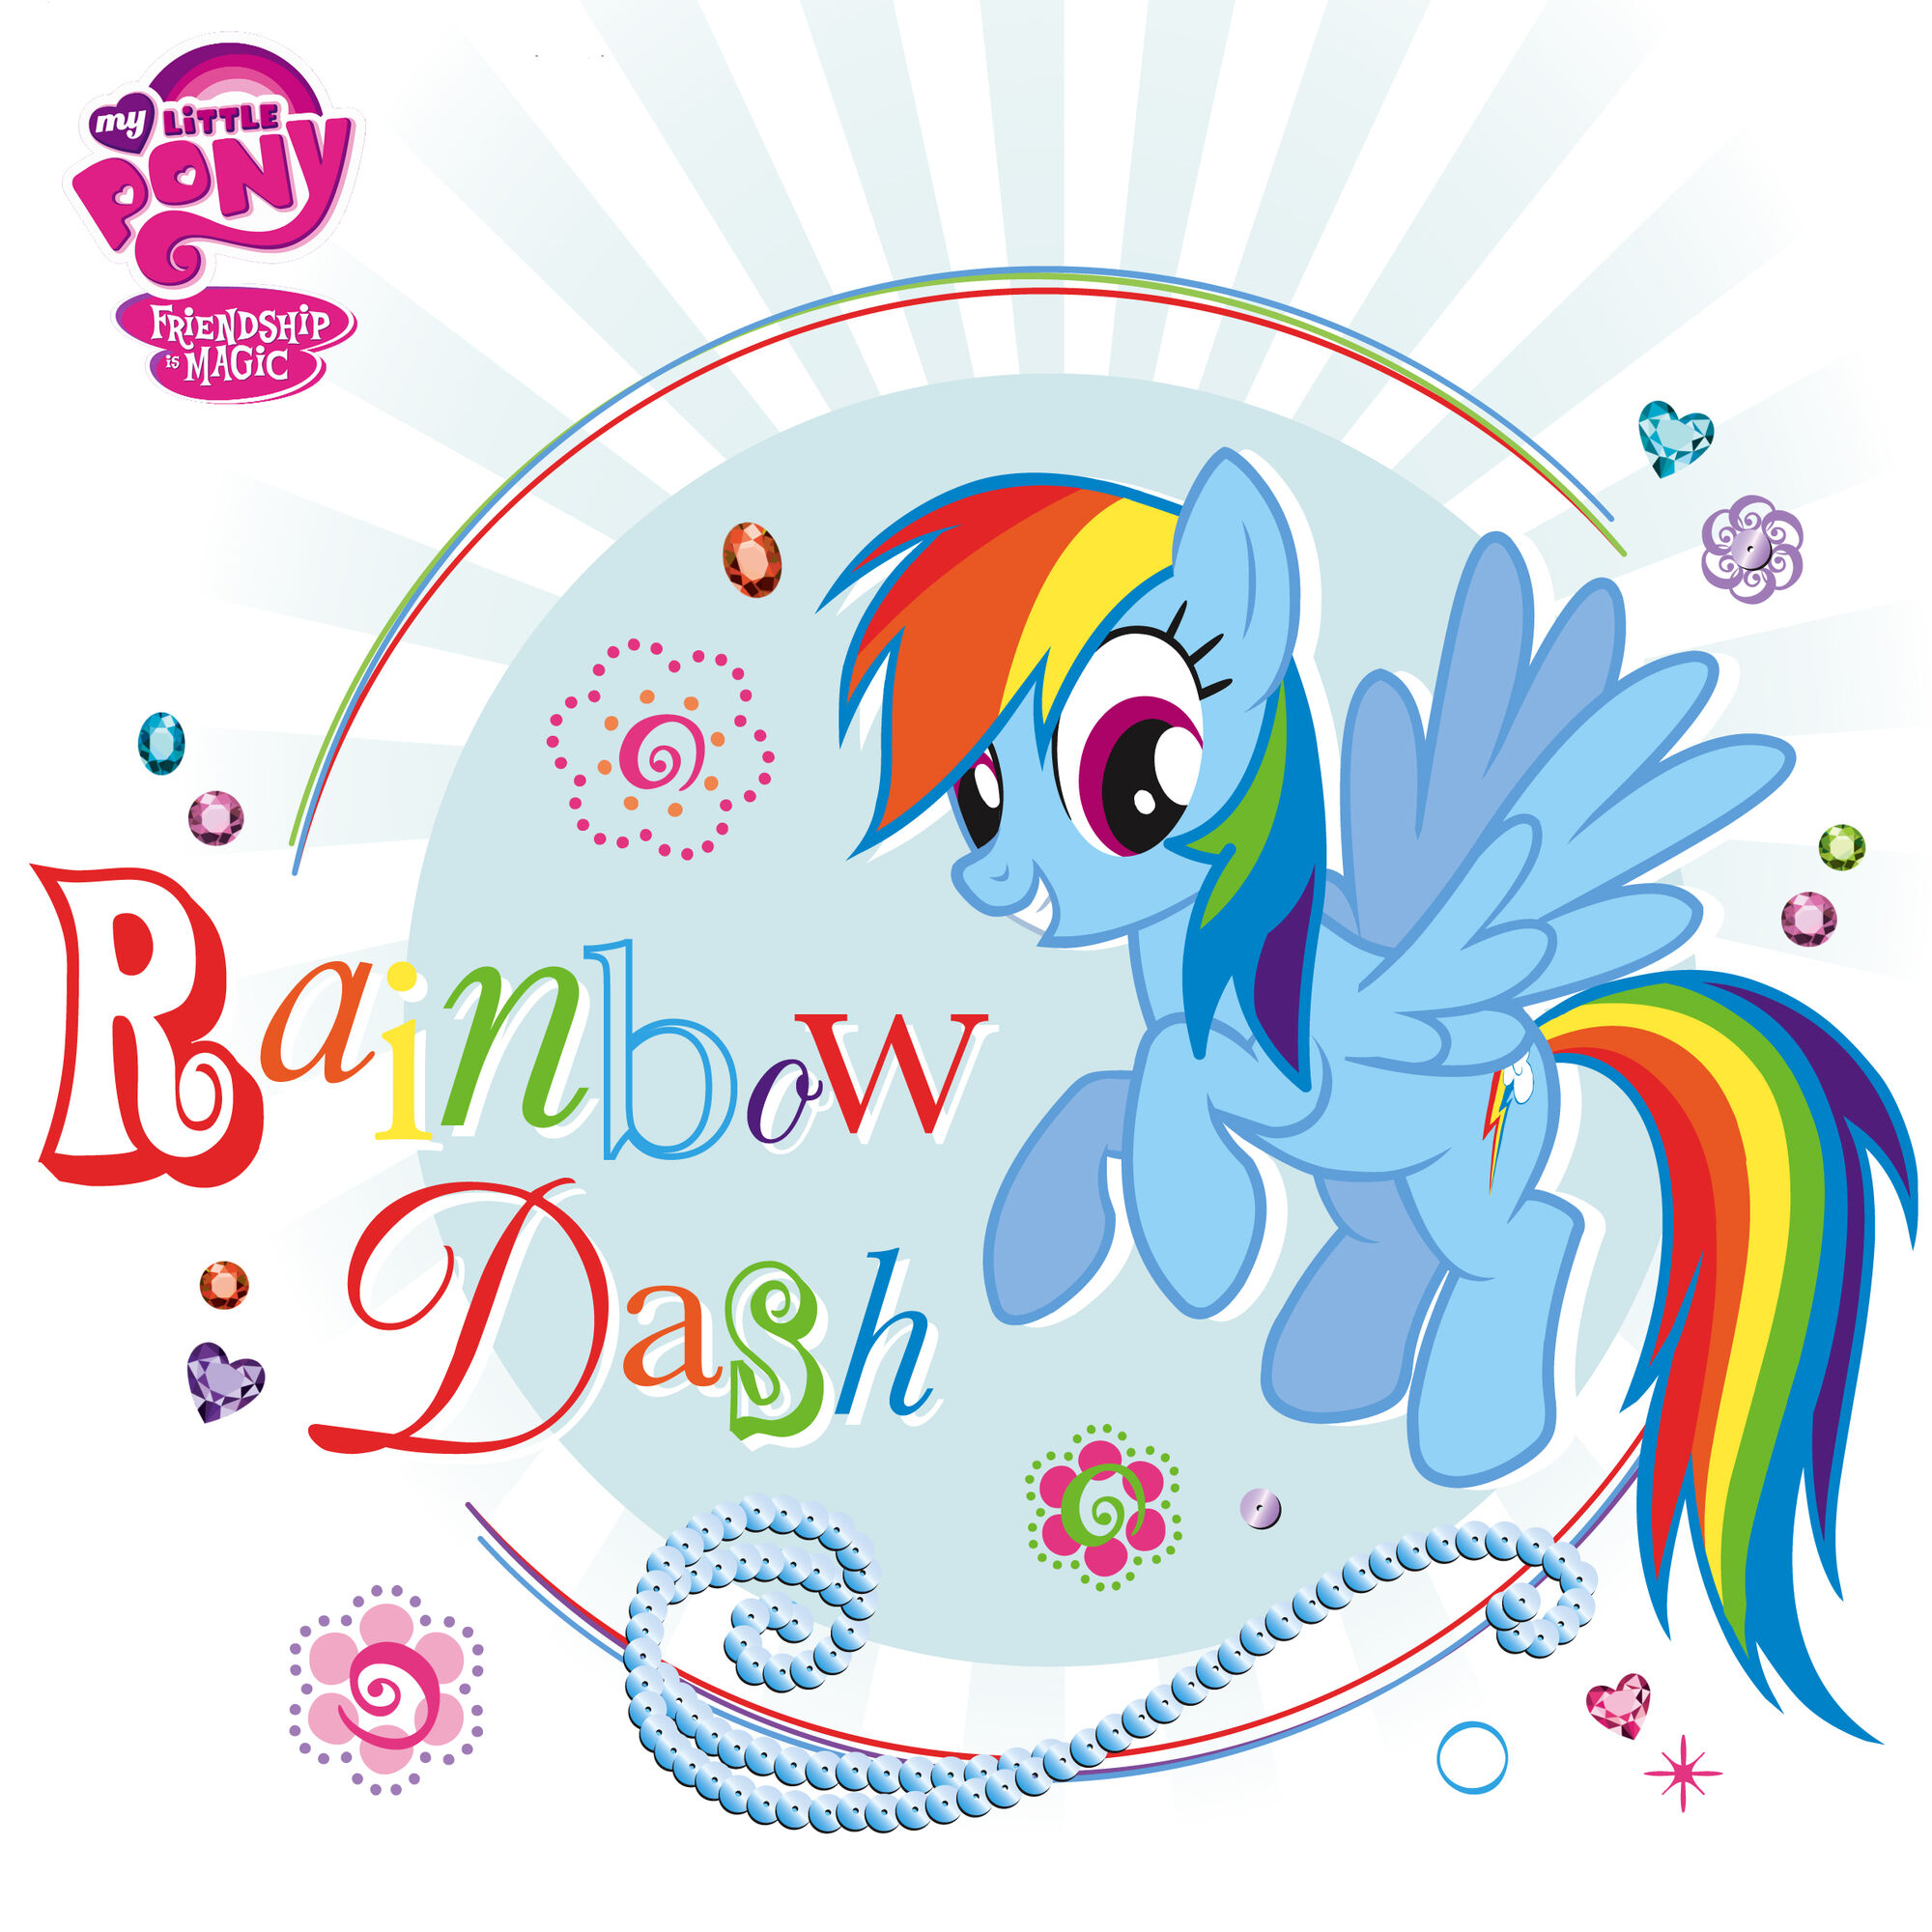 My Little Pony Friendship Is Magic: Best Of Rainbow Dash